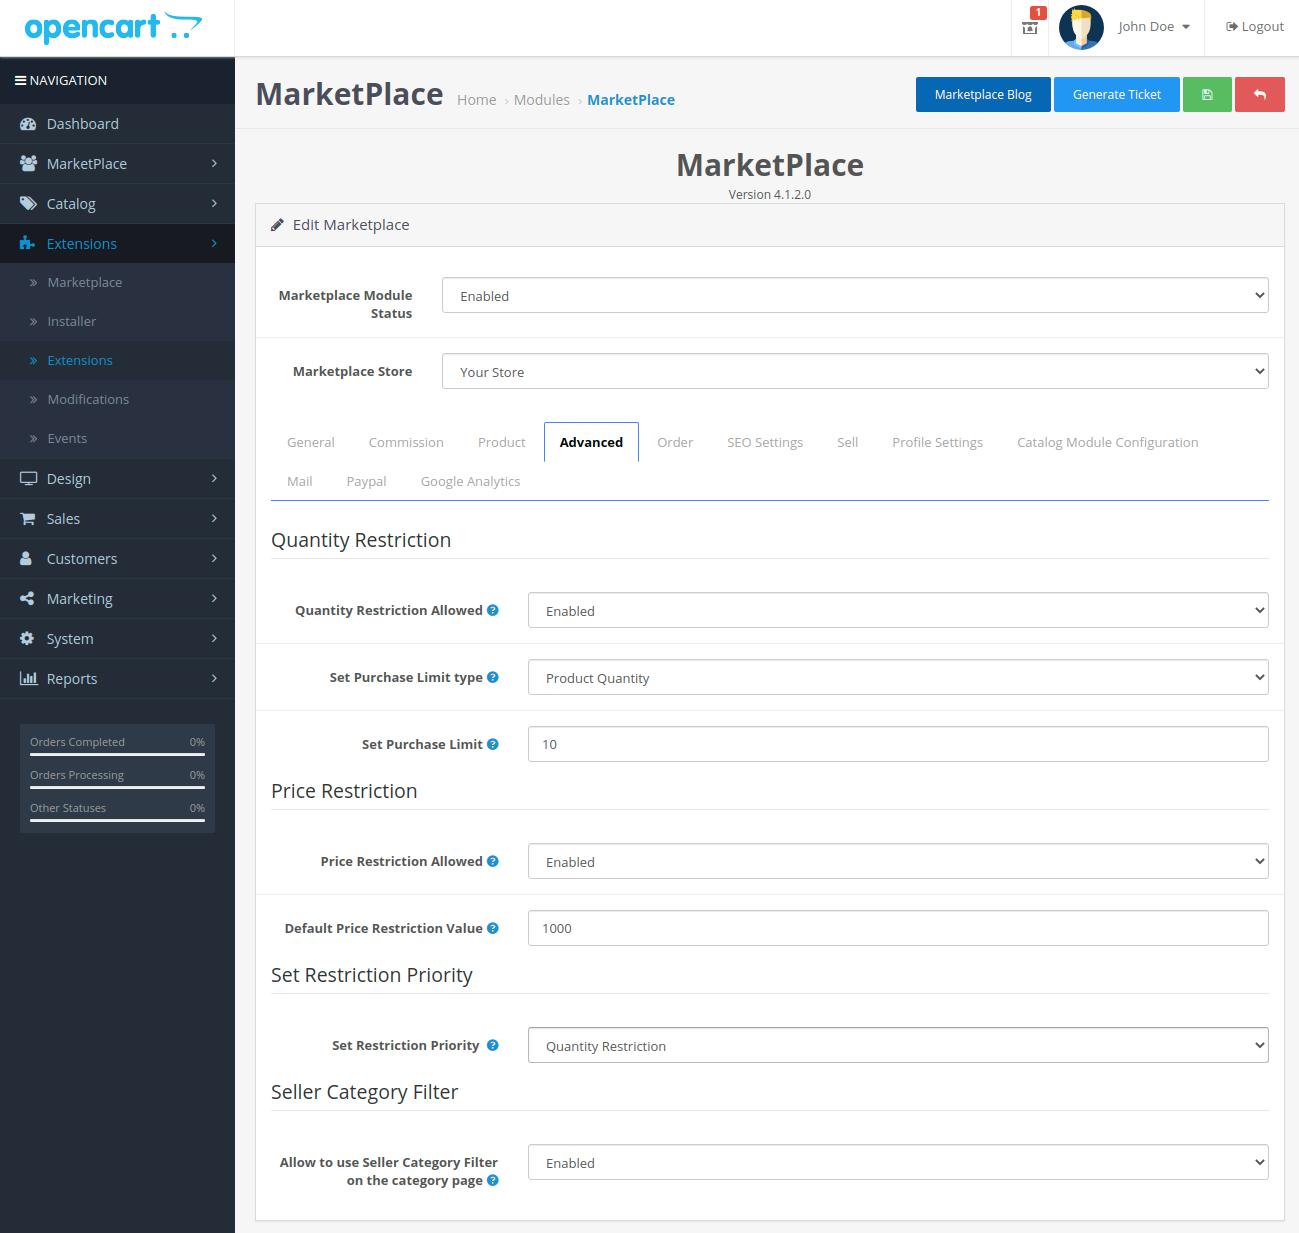 webkul-opencart-multi-vendor-marketplace-advanced-tab